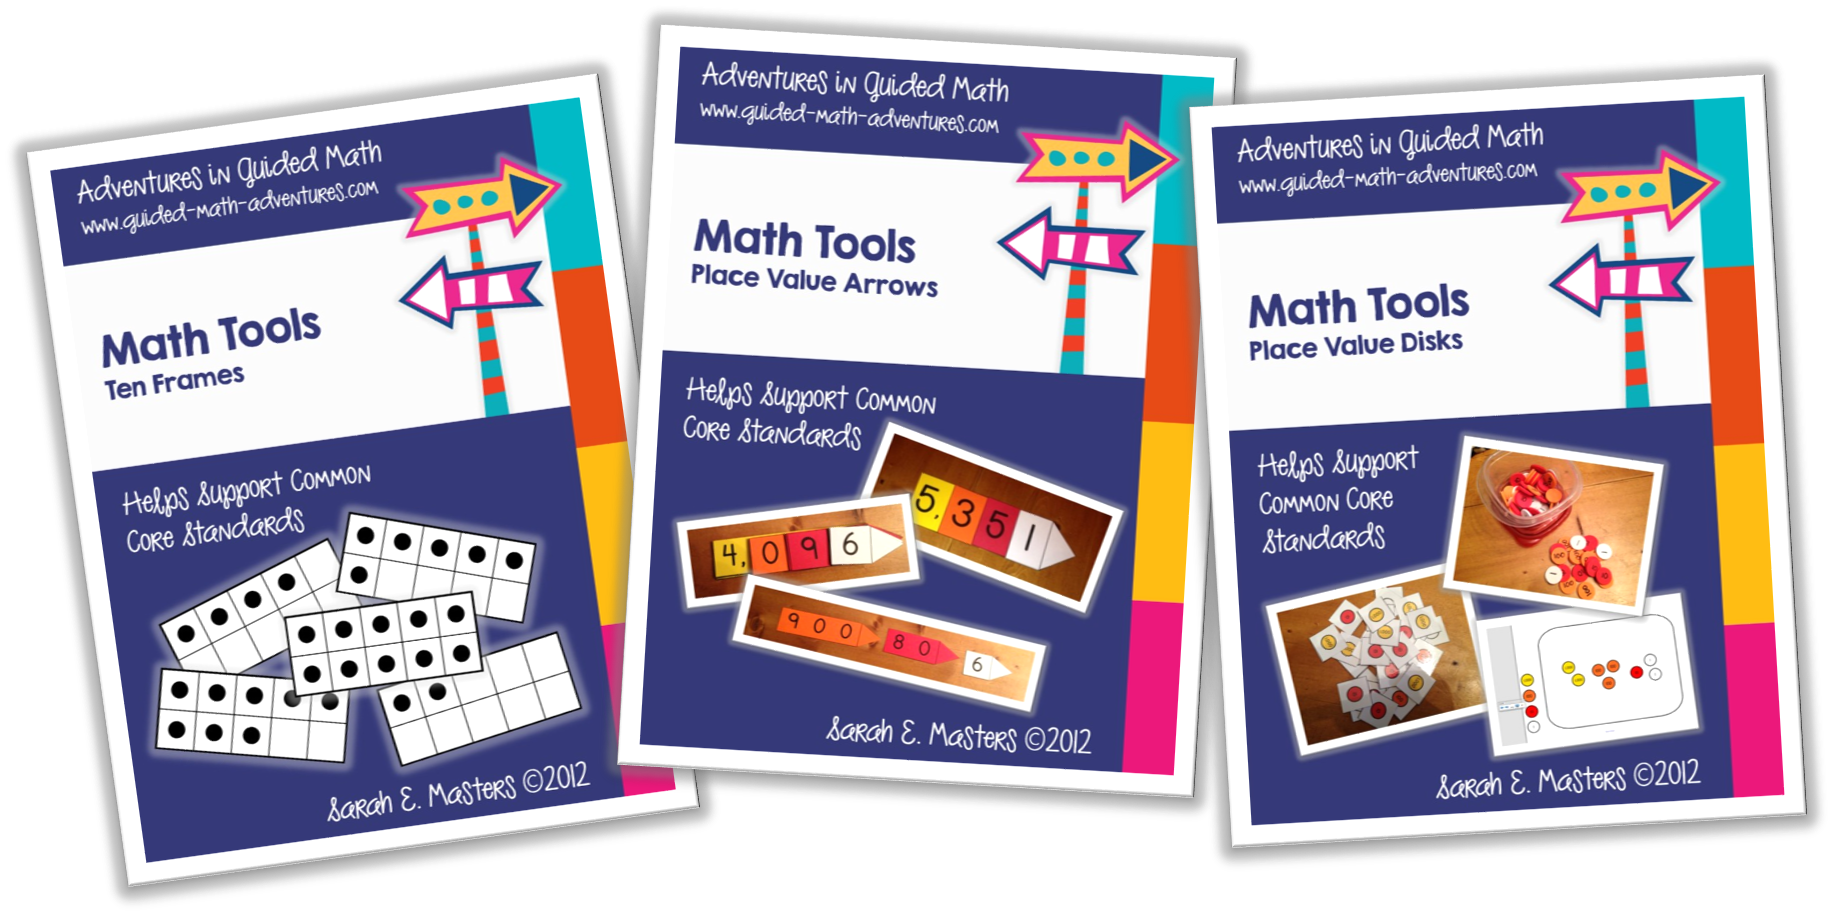 Math tools enjoy the. Study clipart mathematics book